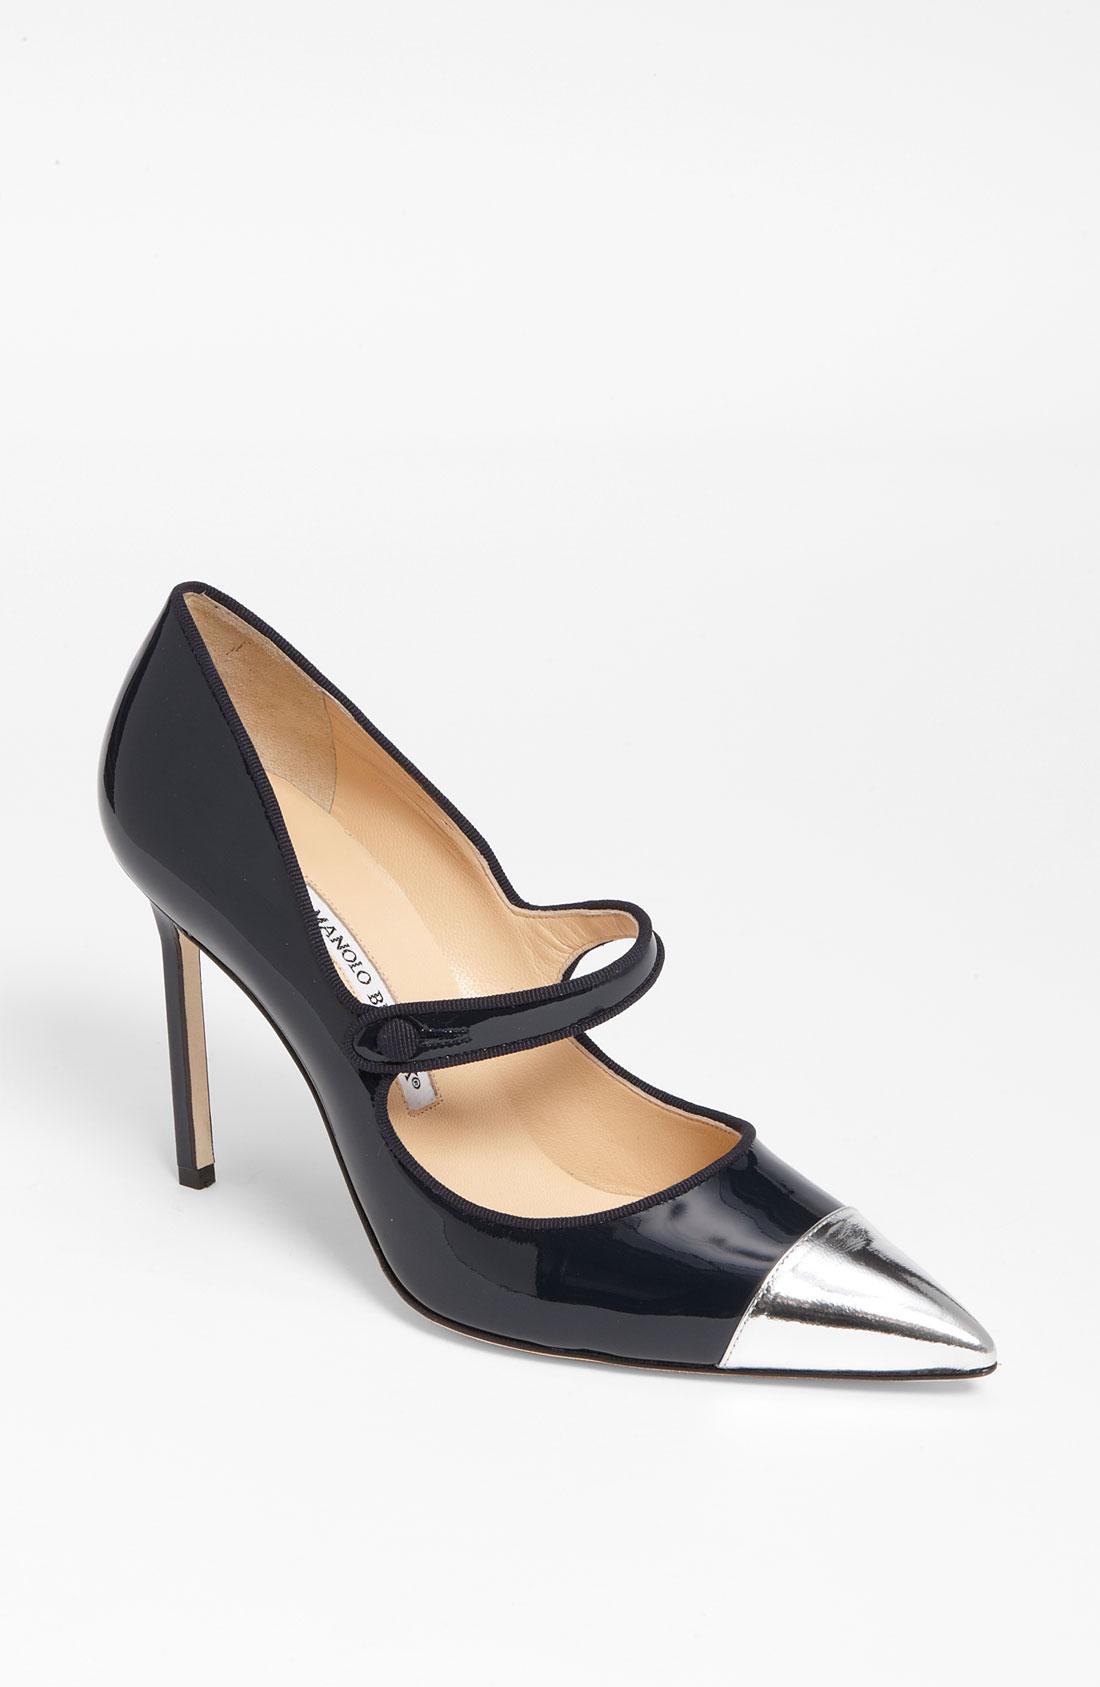 2 Inch Heels Silver